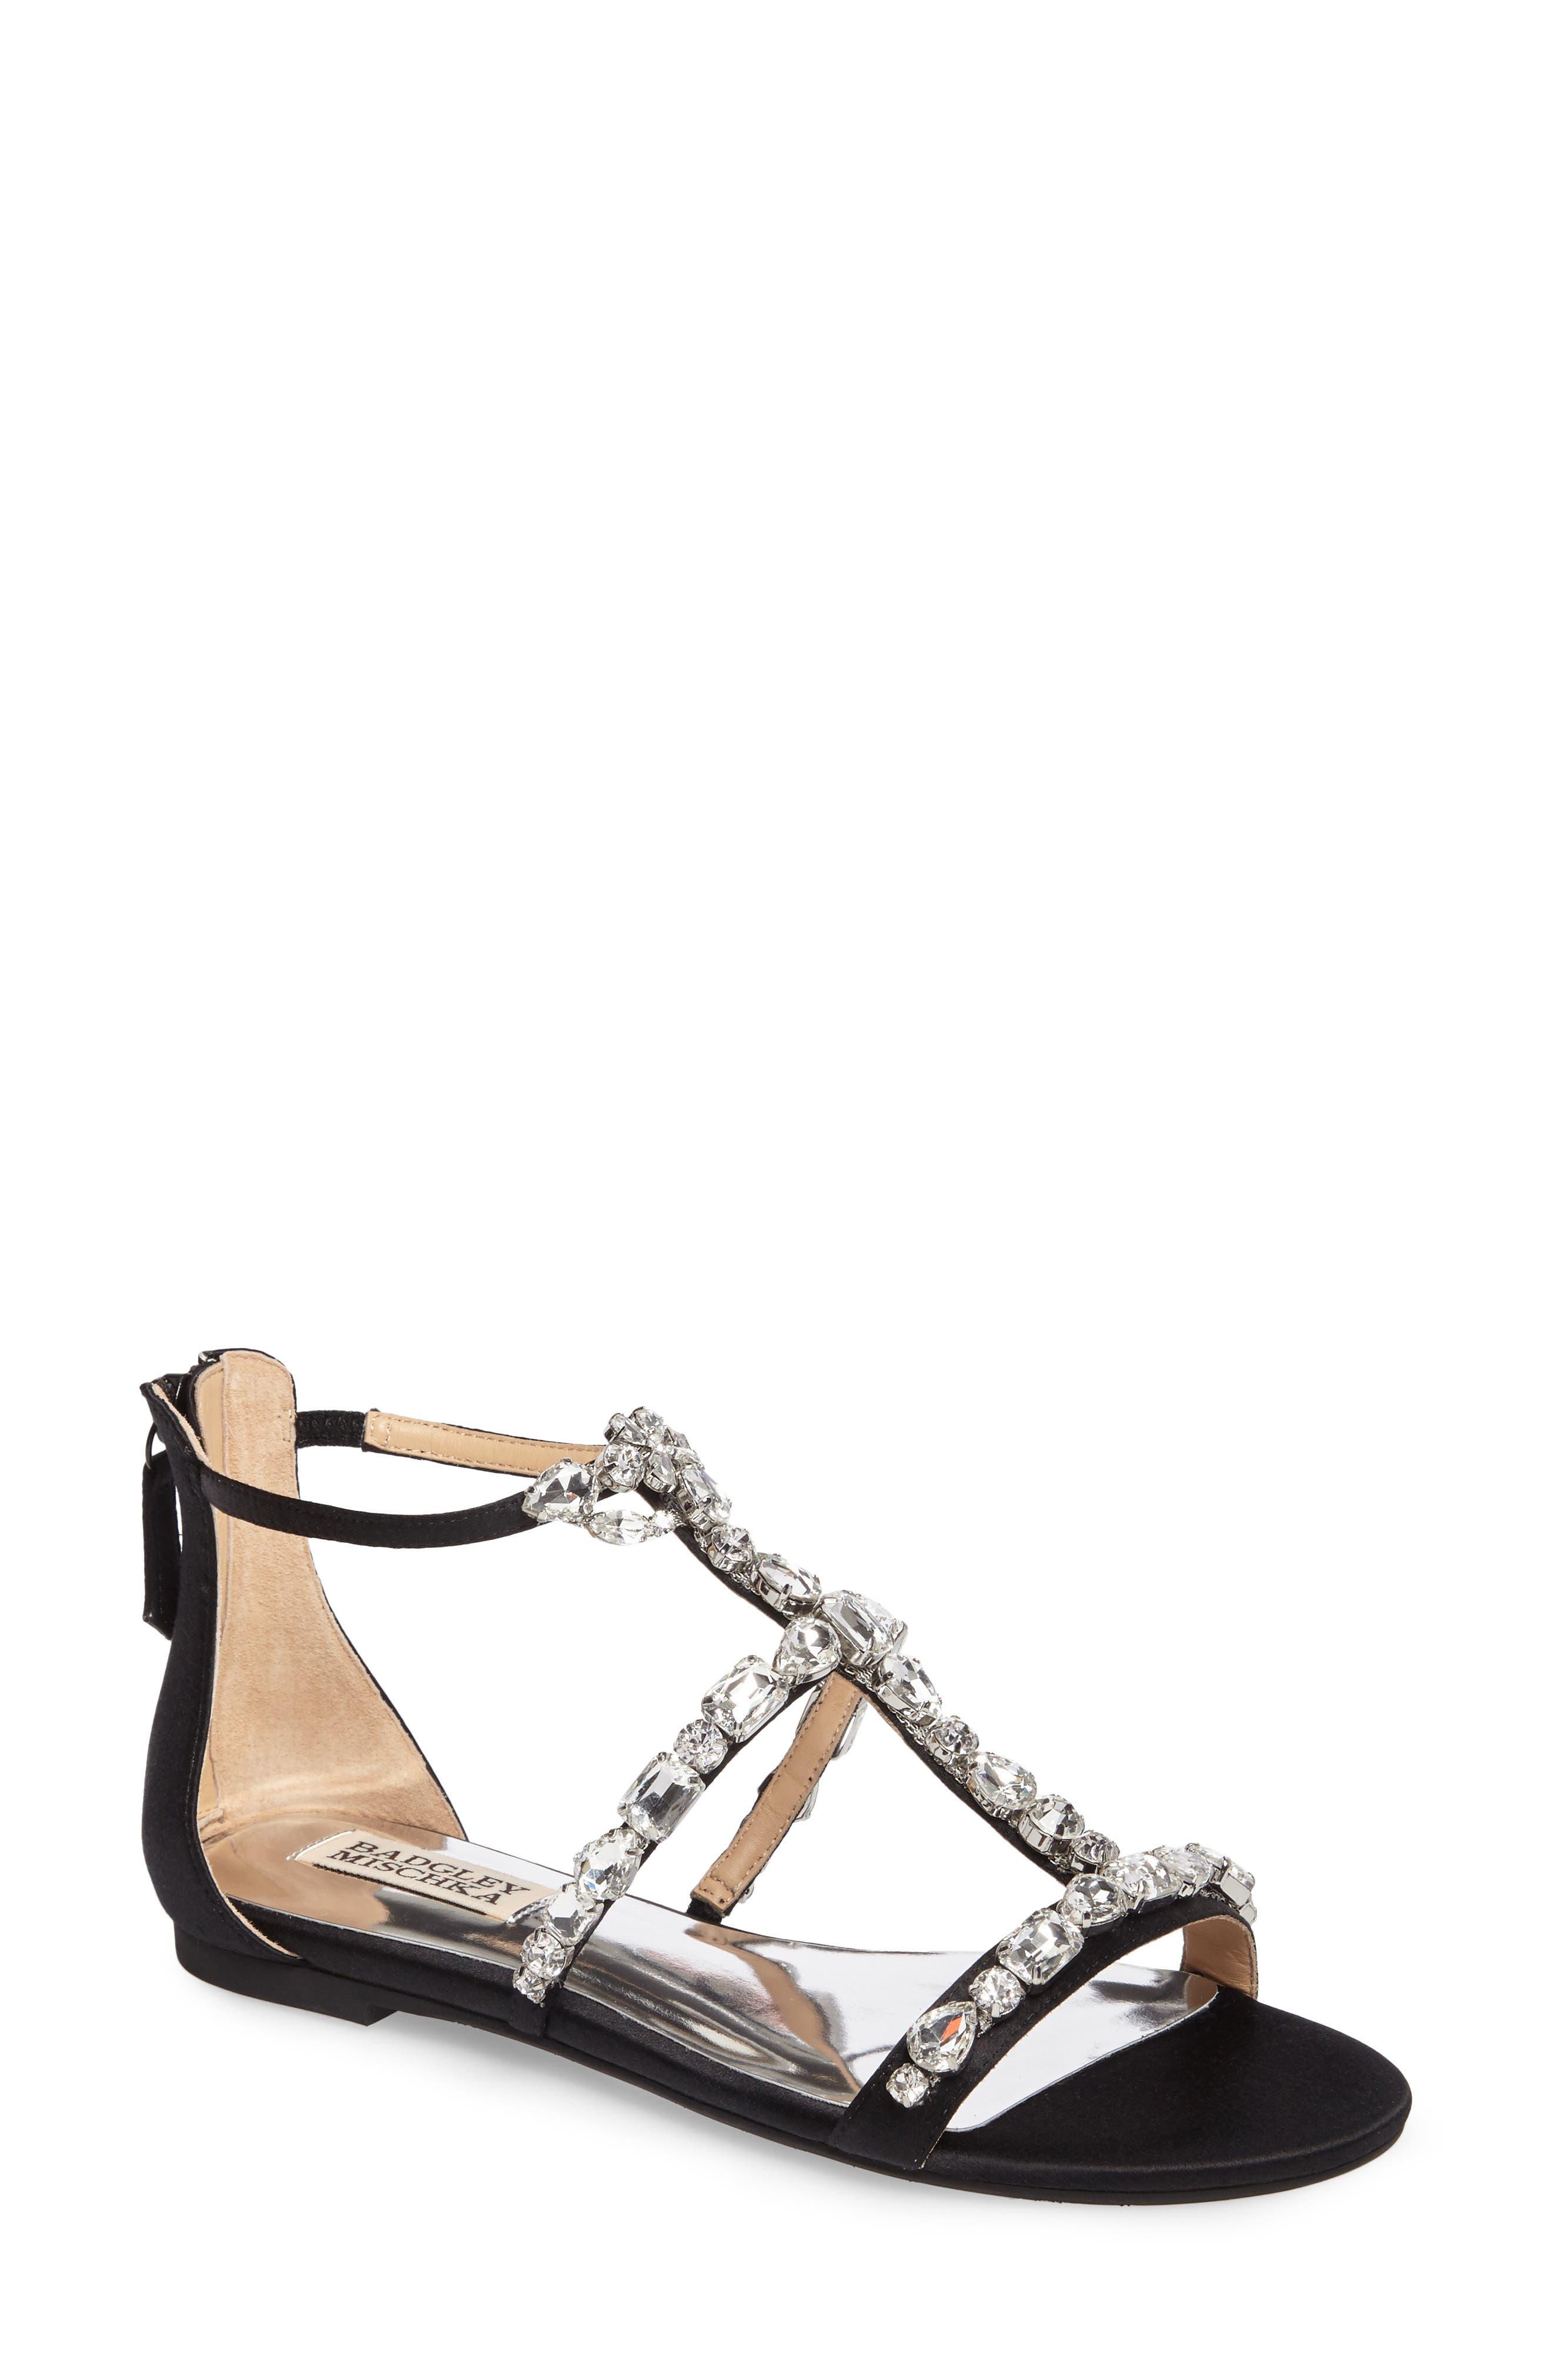 Main Image - Badgley Mischka Warren Crystal Embellished Sandal (Women)